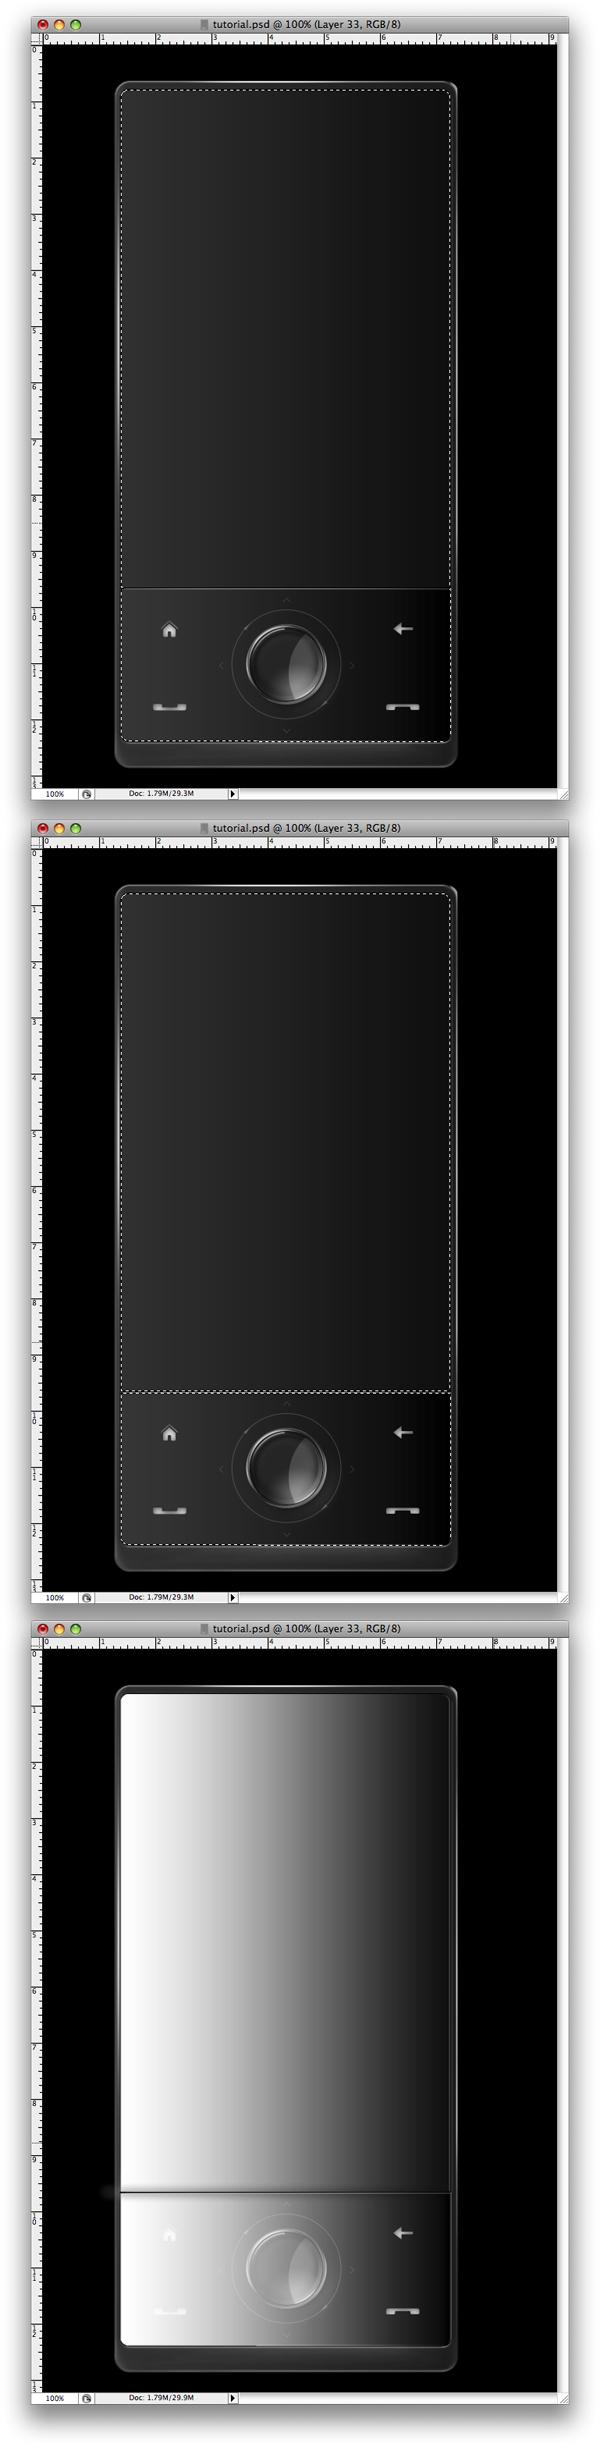 [Tutorial] Celular HTC Touch Diamond 32